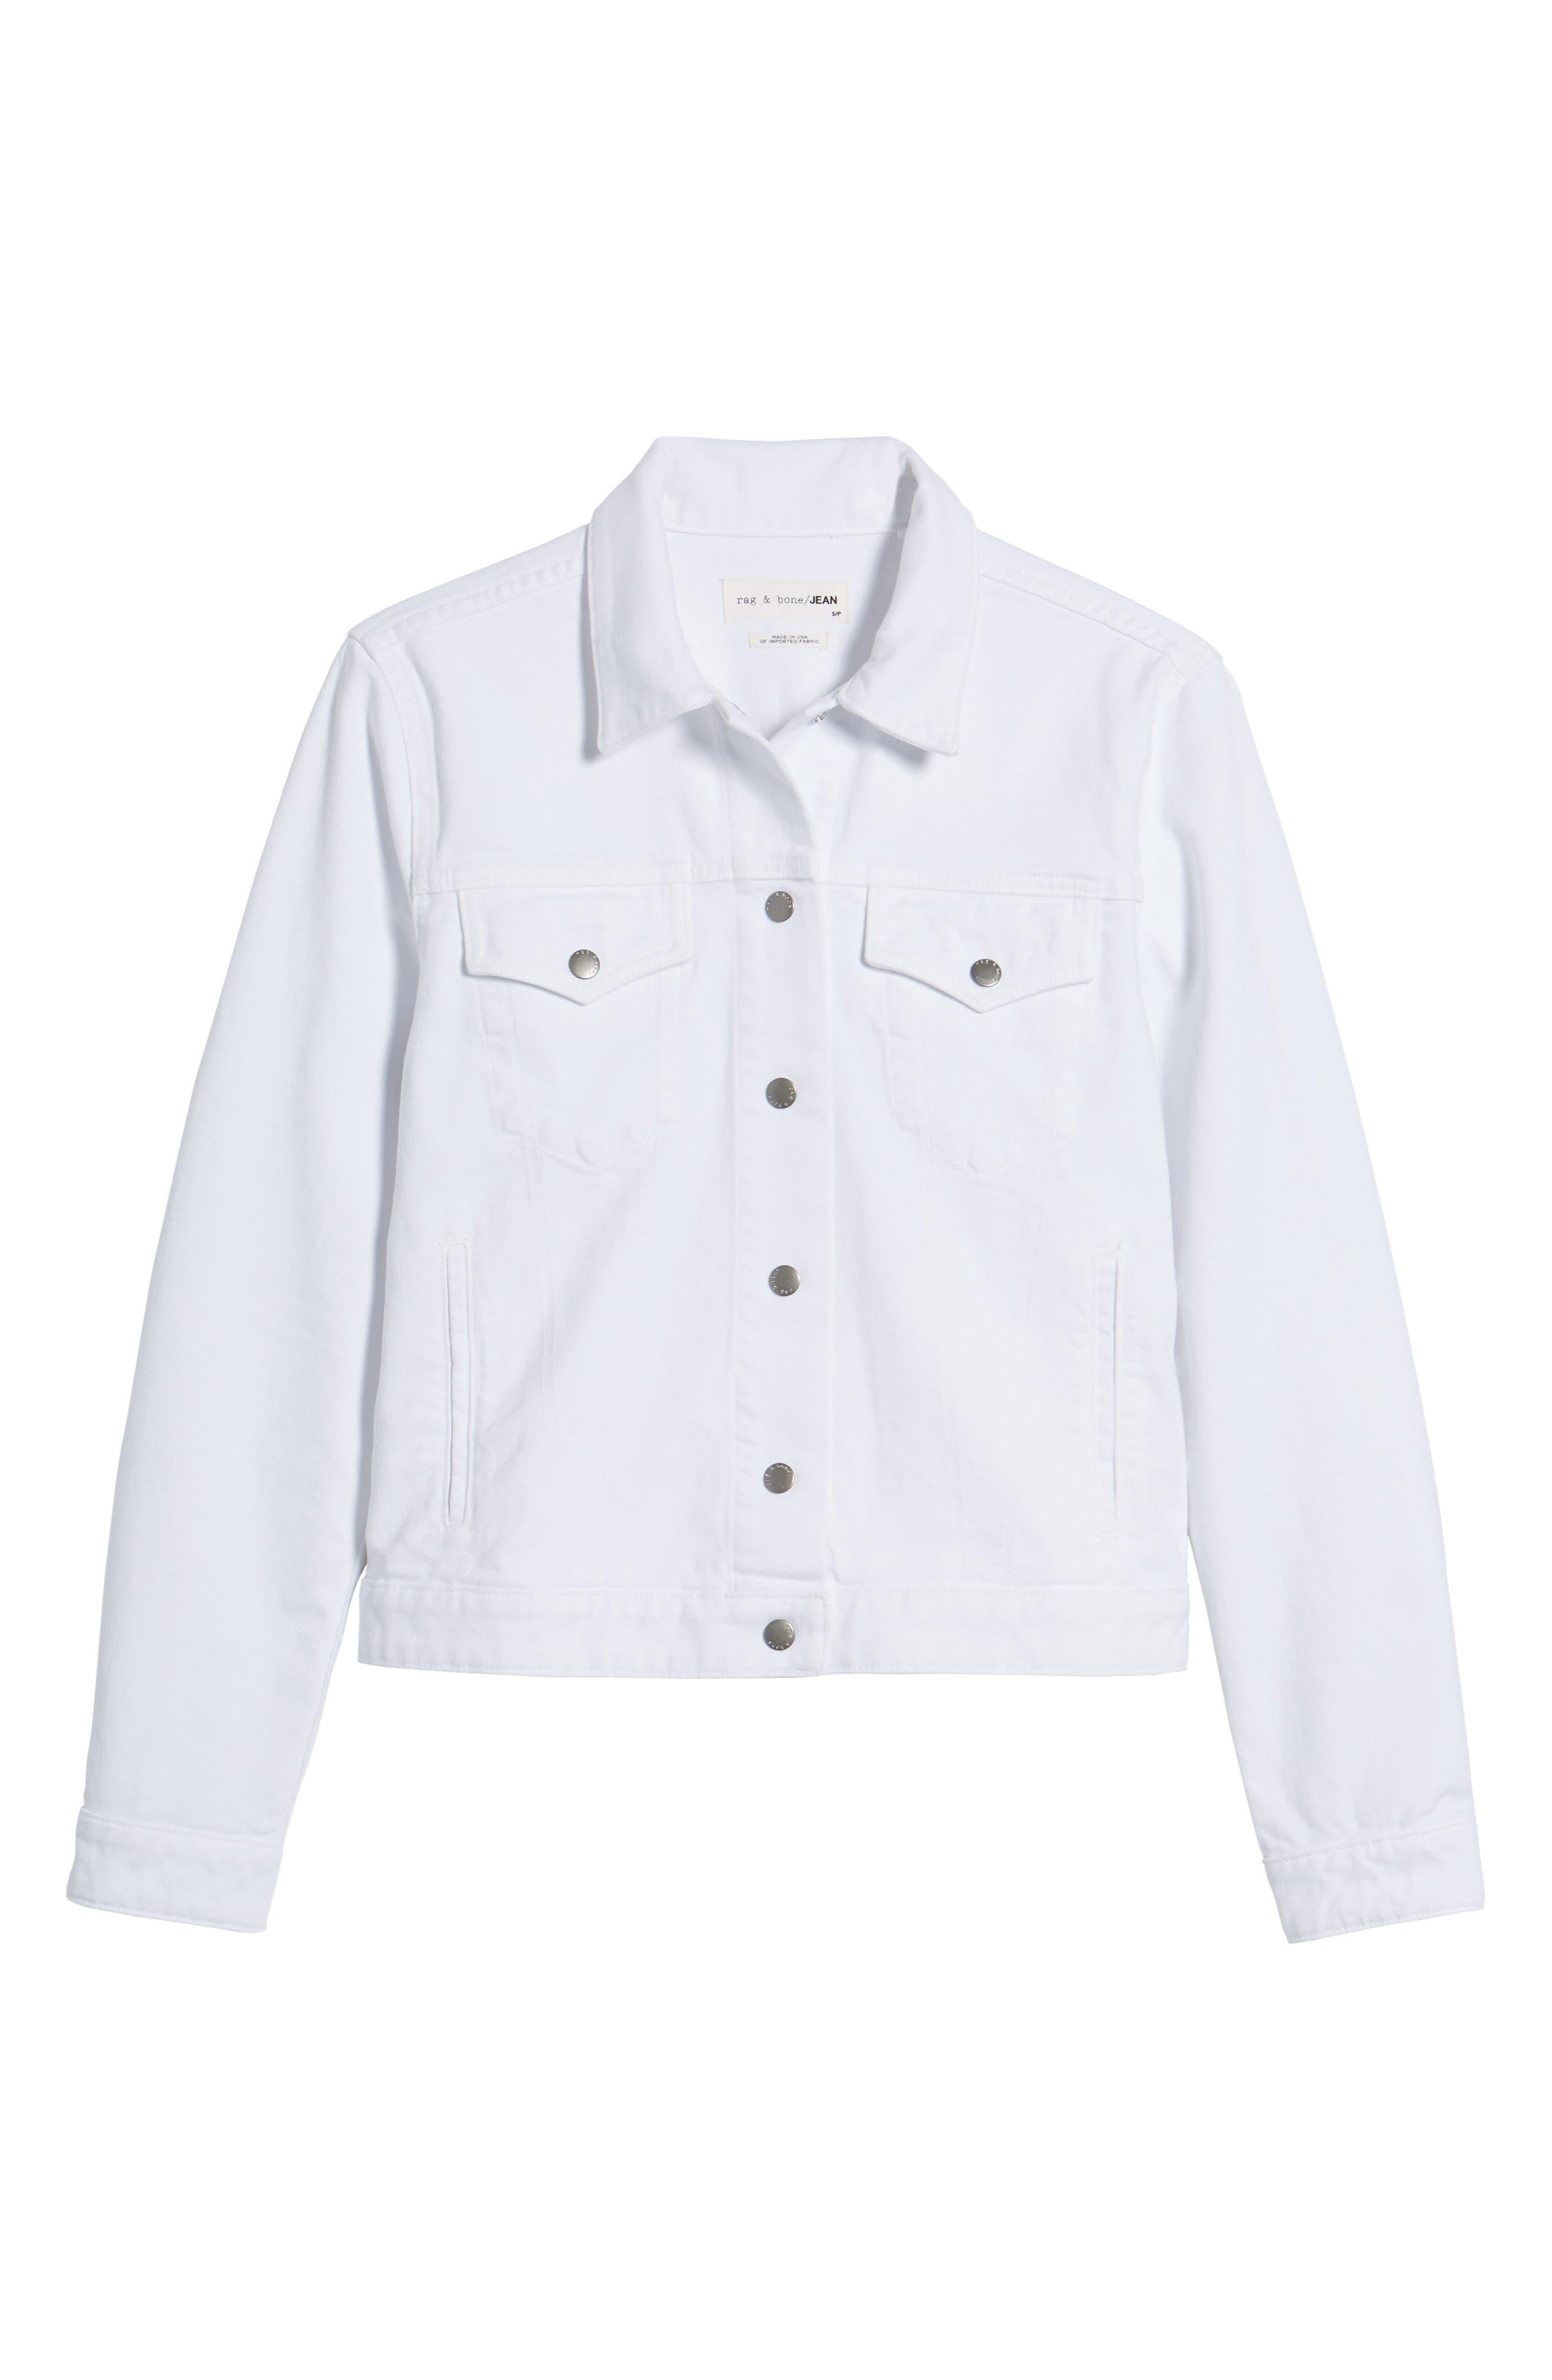 Nico Denim Jacket,                             Alternate thumbnail 7, color,                             White